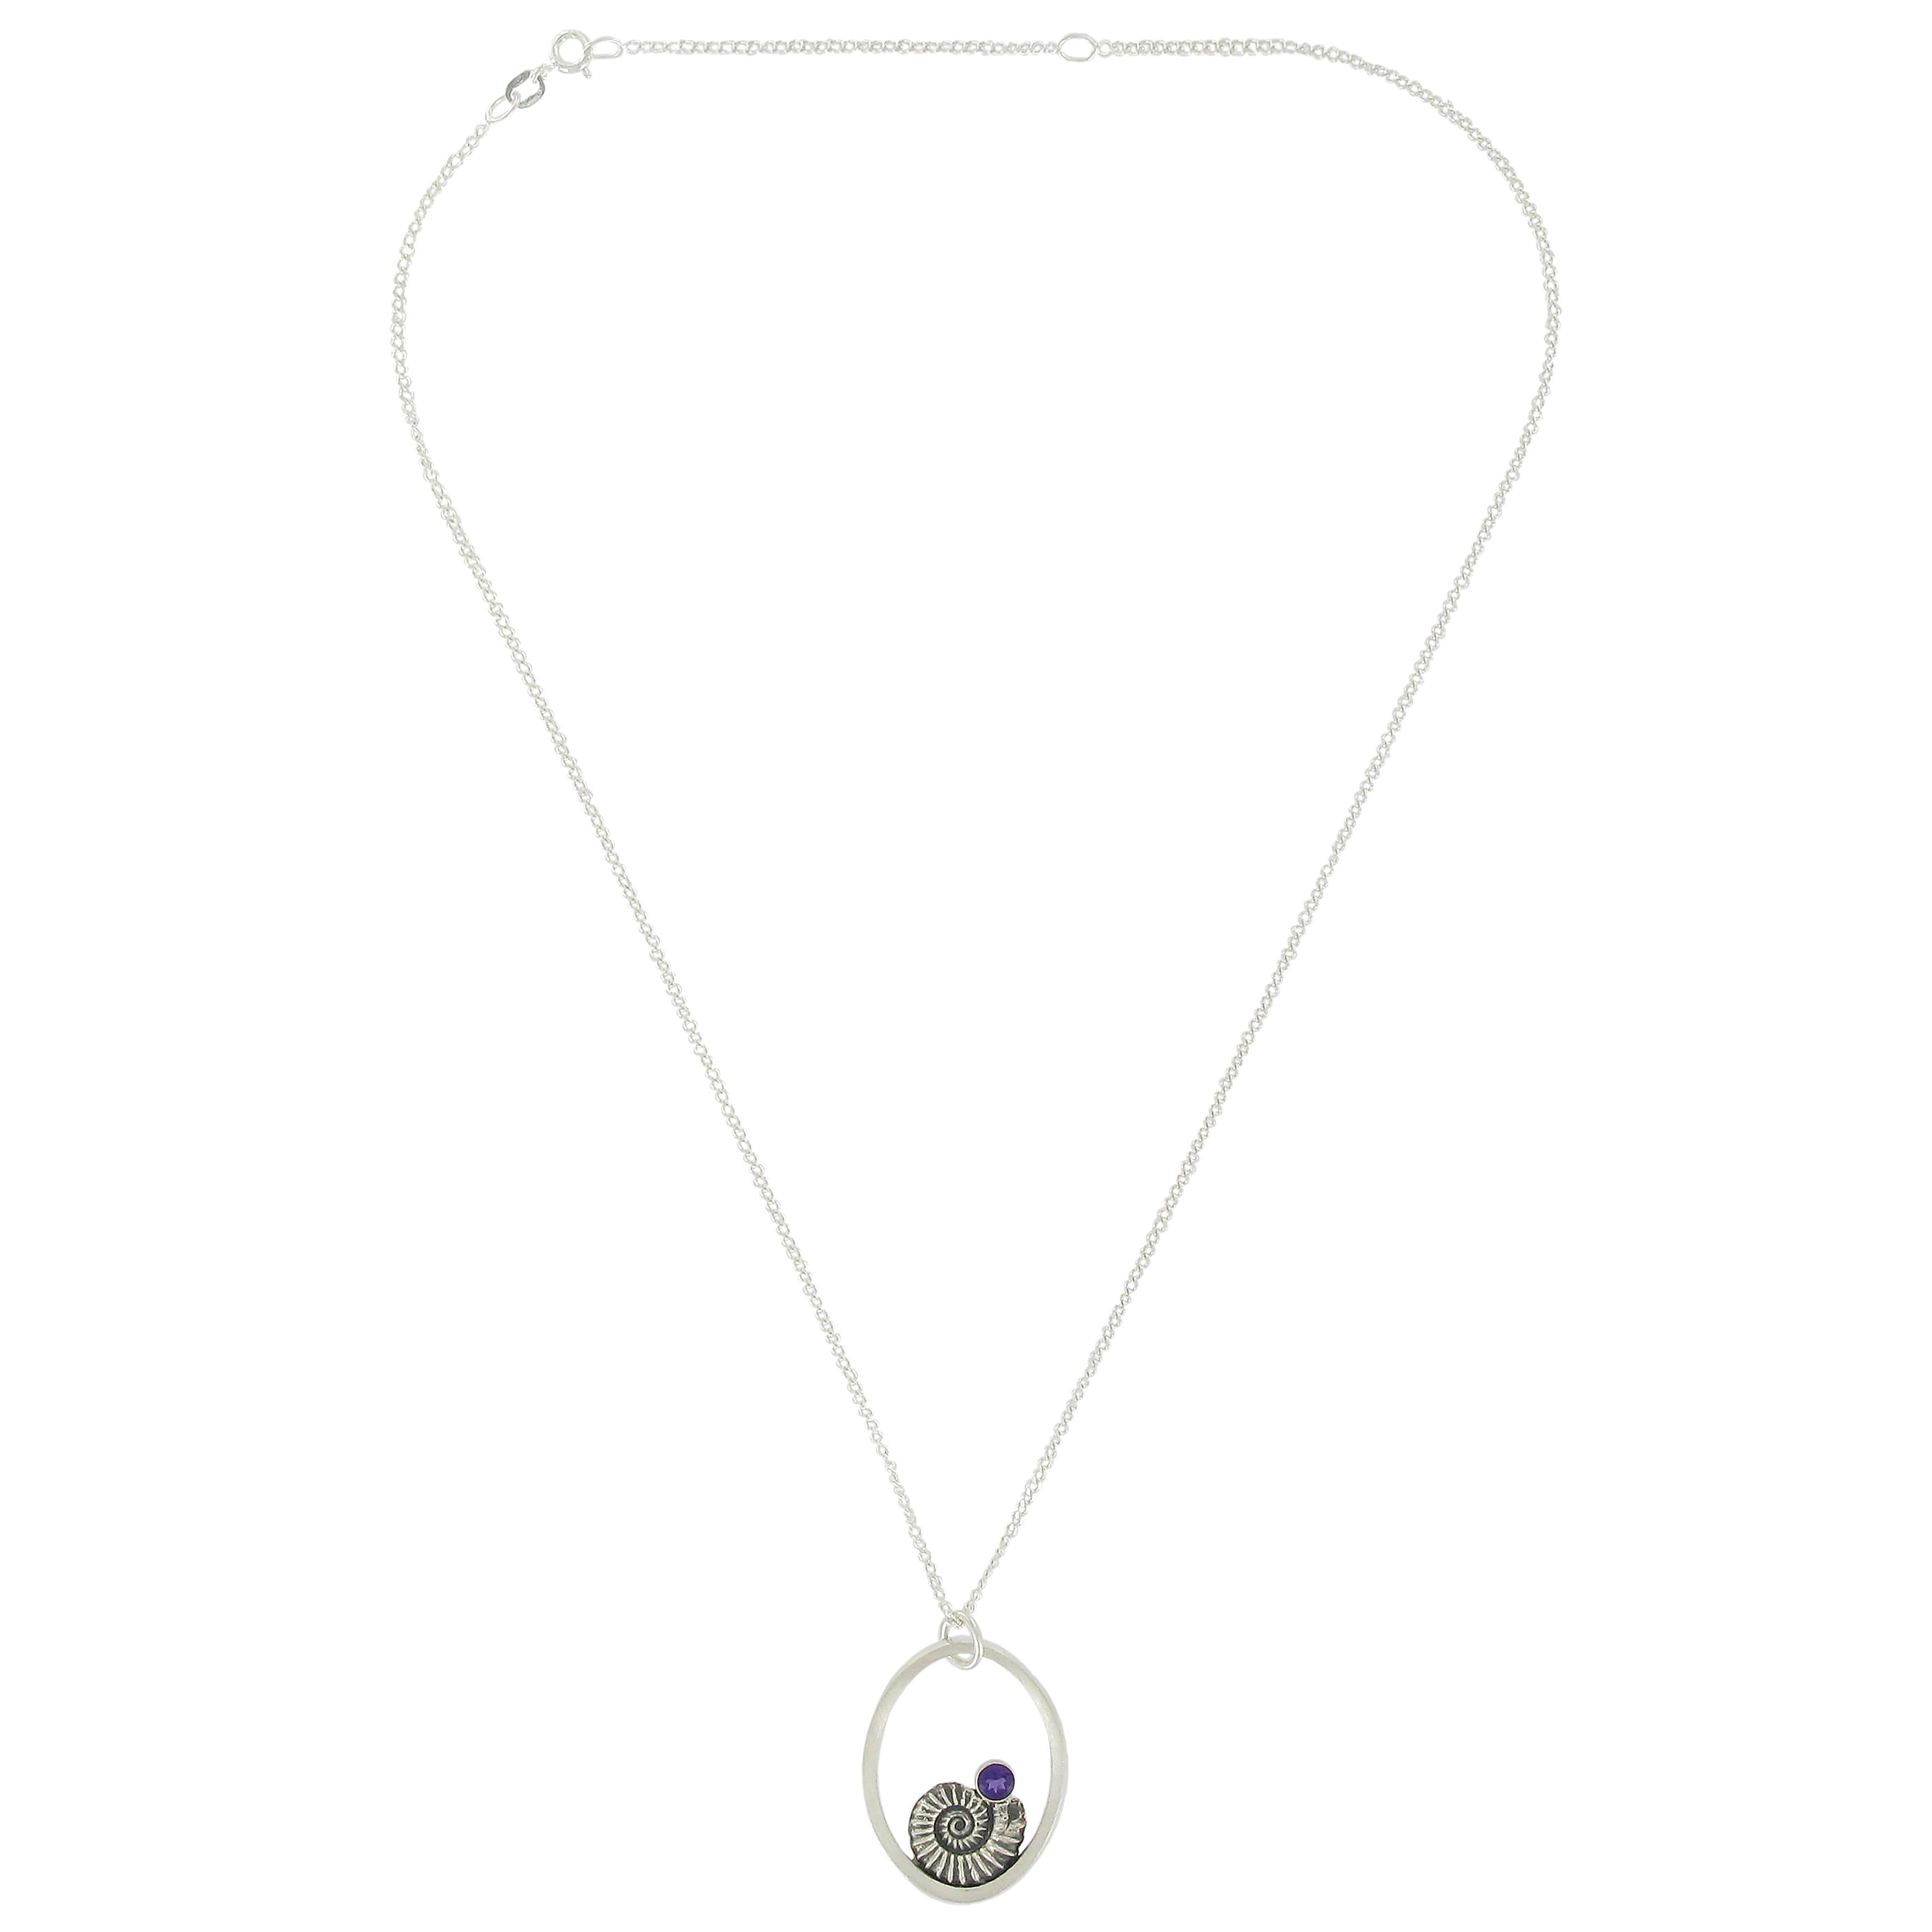 Amethyst ammonite necklace